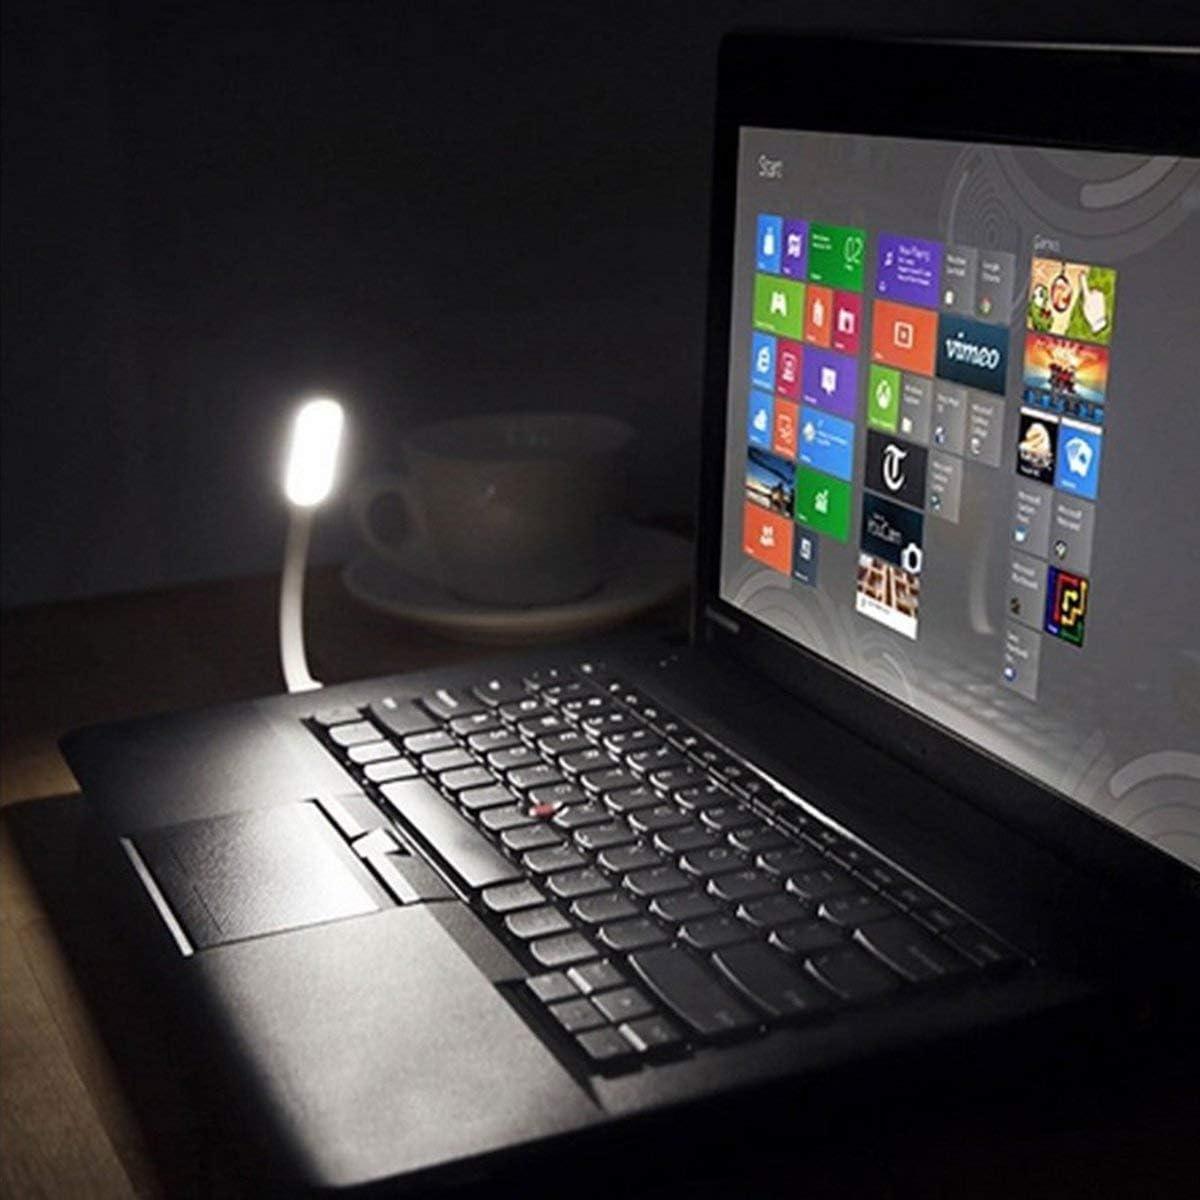 Gugutogo Mini USB LED Light Lamp 180 Degree Adjustable Portable Flexible for powerbank PC Laptop Notebook Computer Night Working